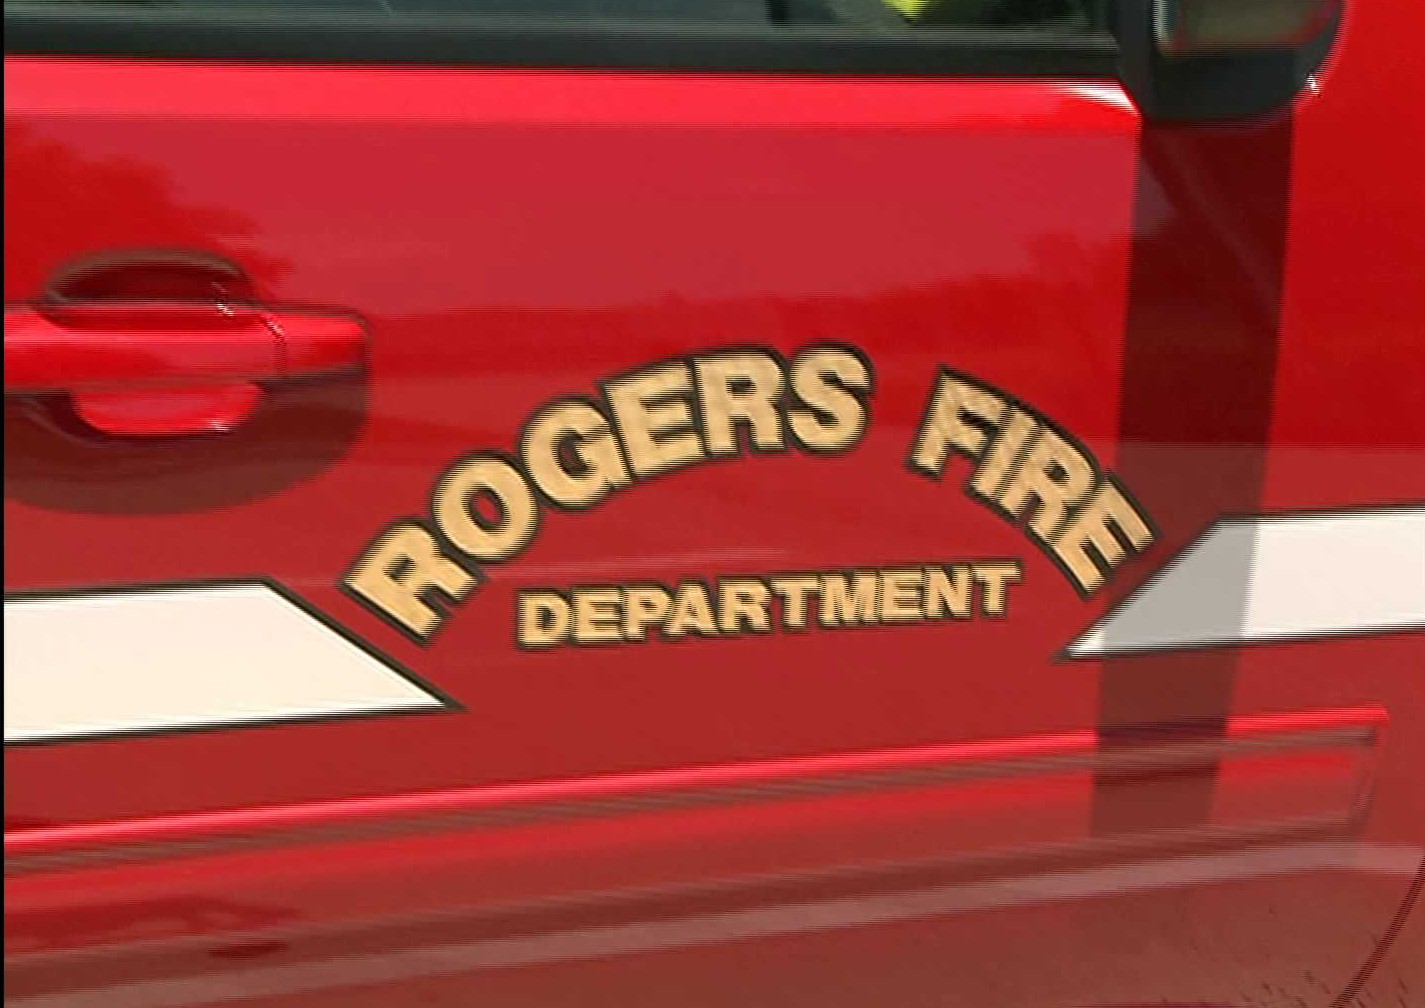 rogersfire